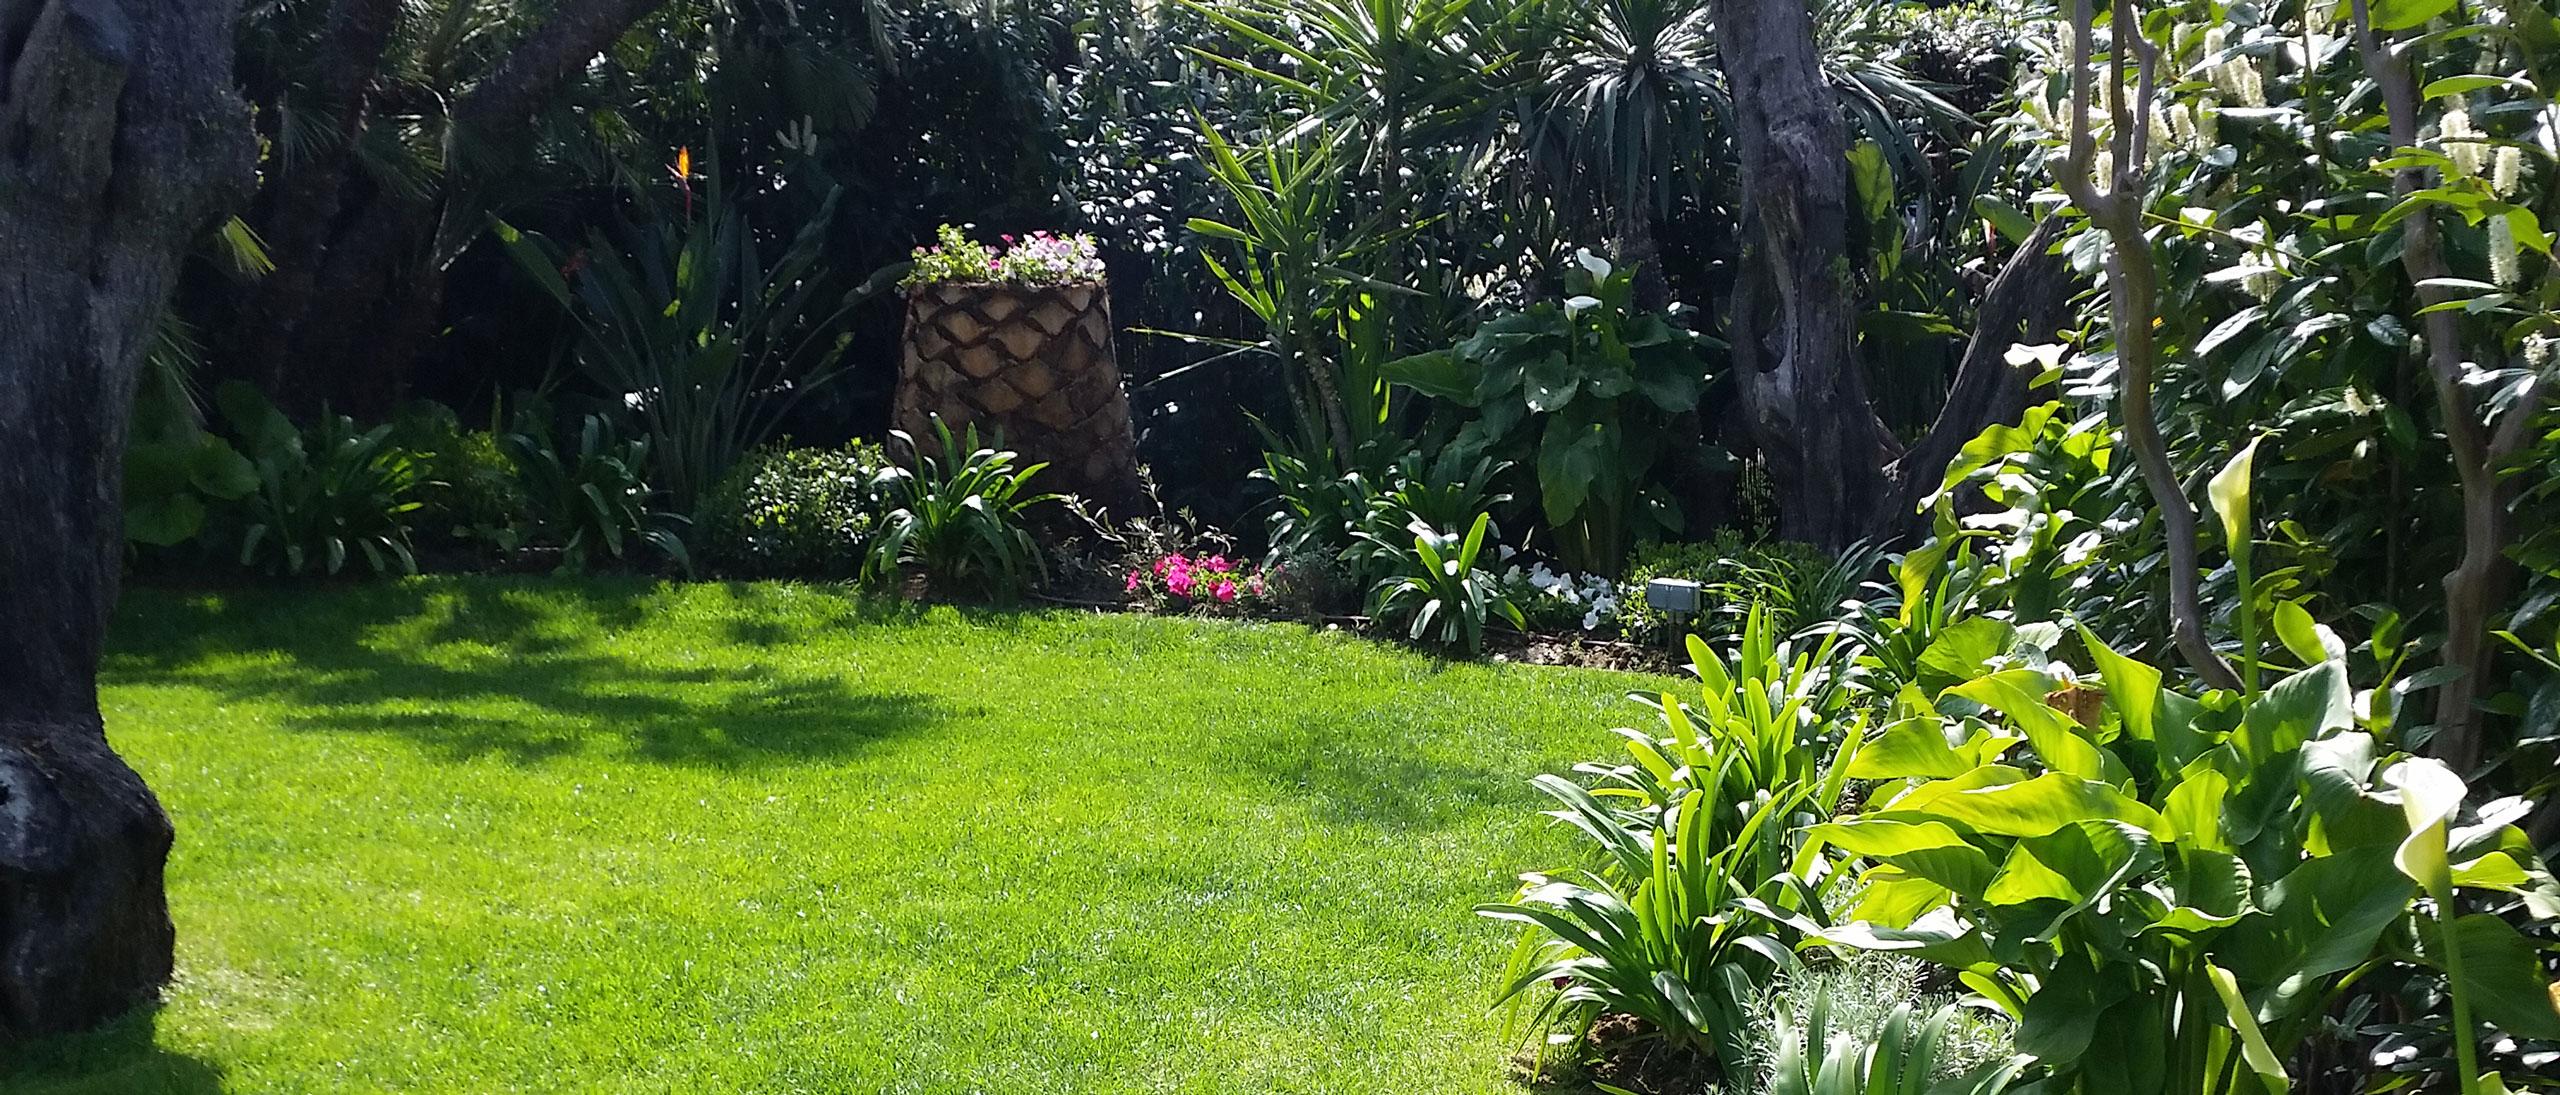 Ab jardin sp cialiste de la cr ation entretien de for Entretien jardin 68